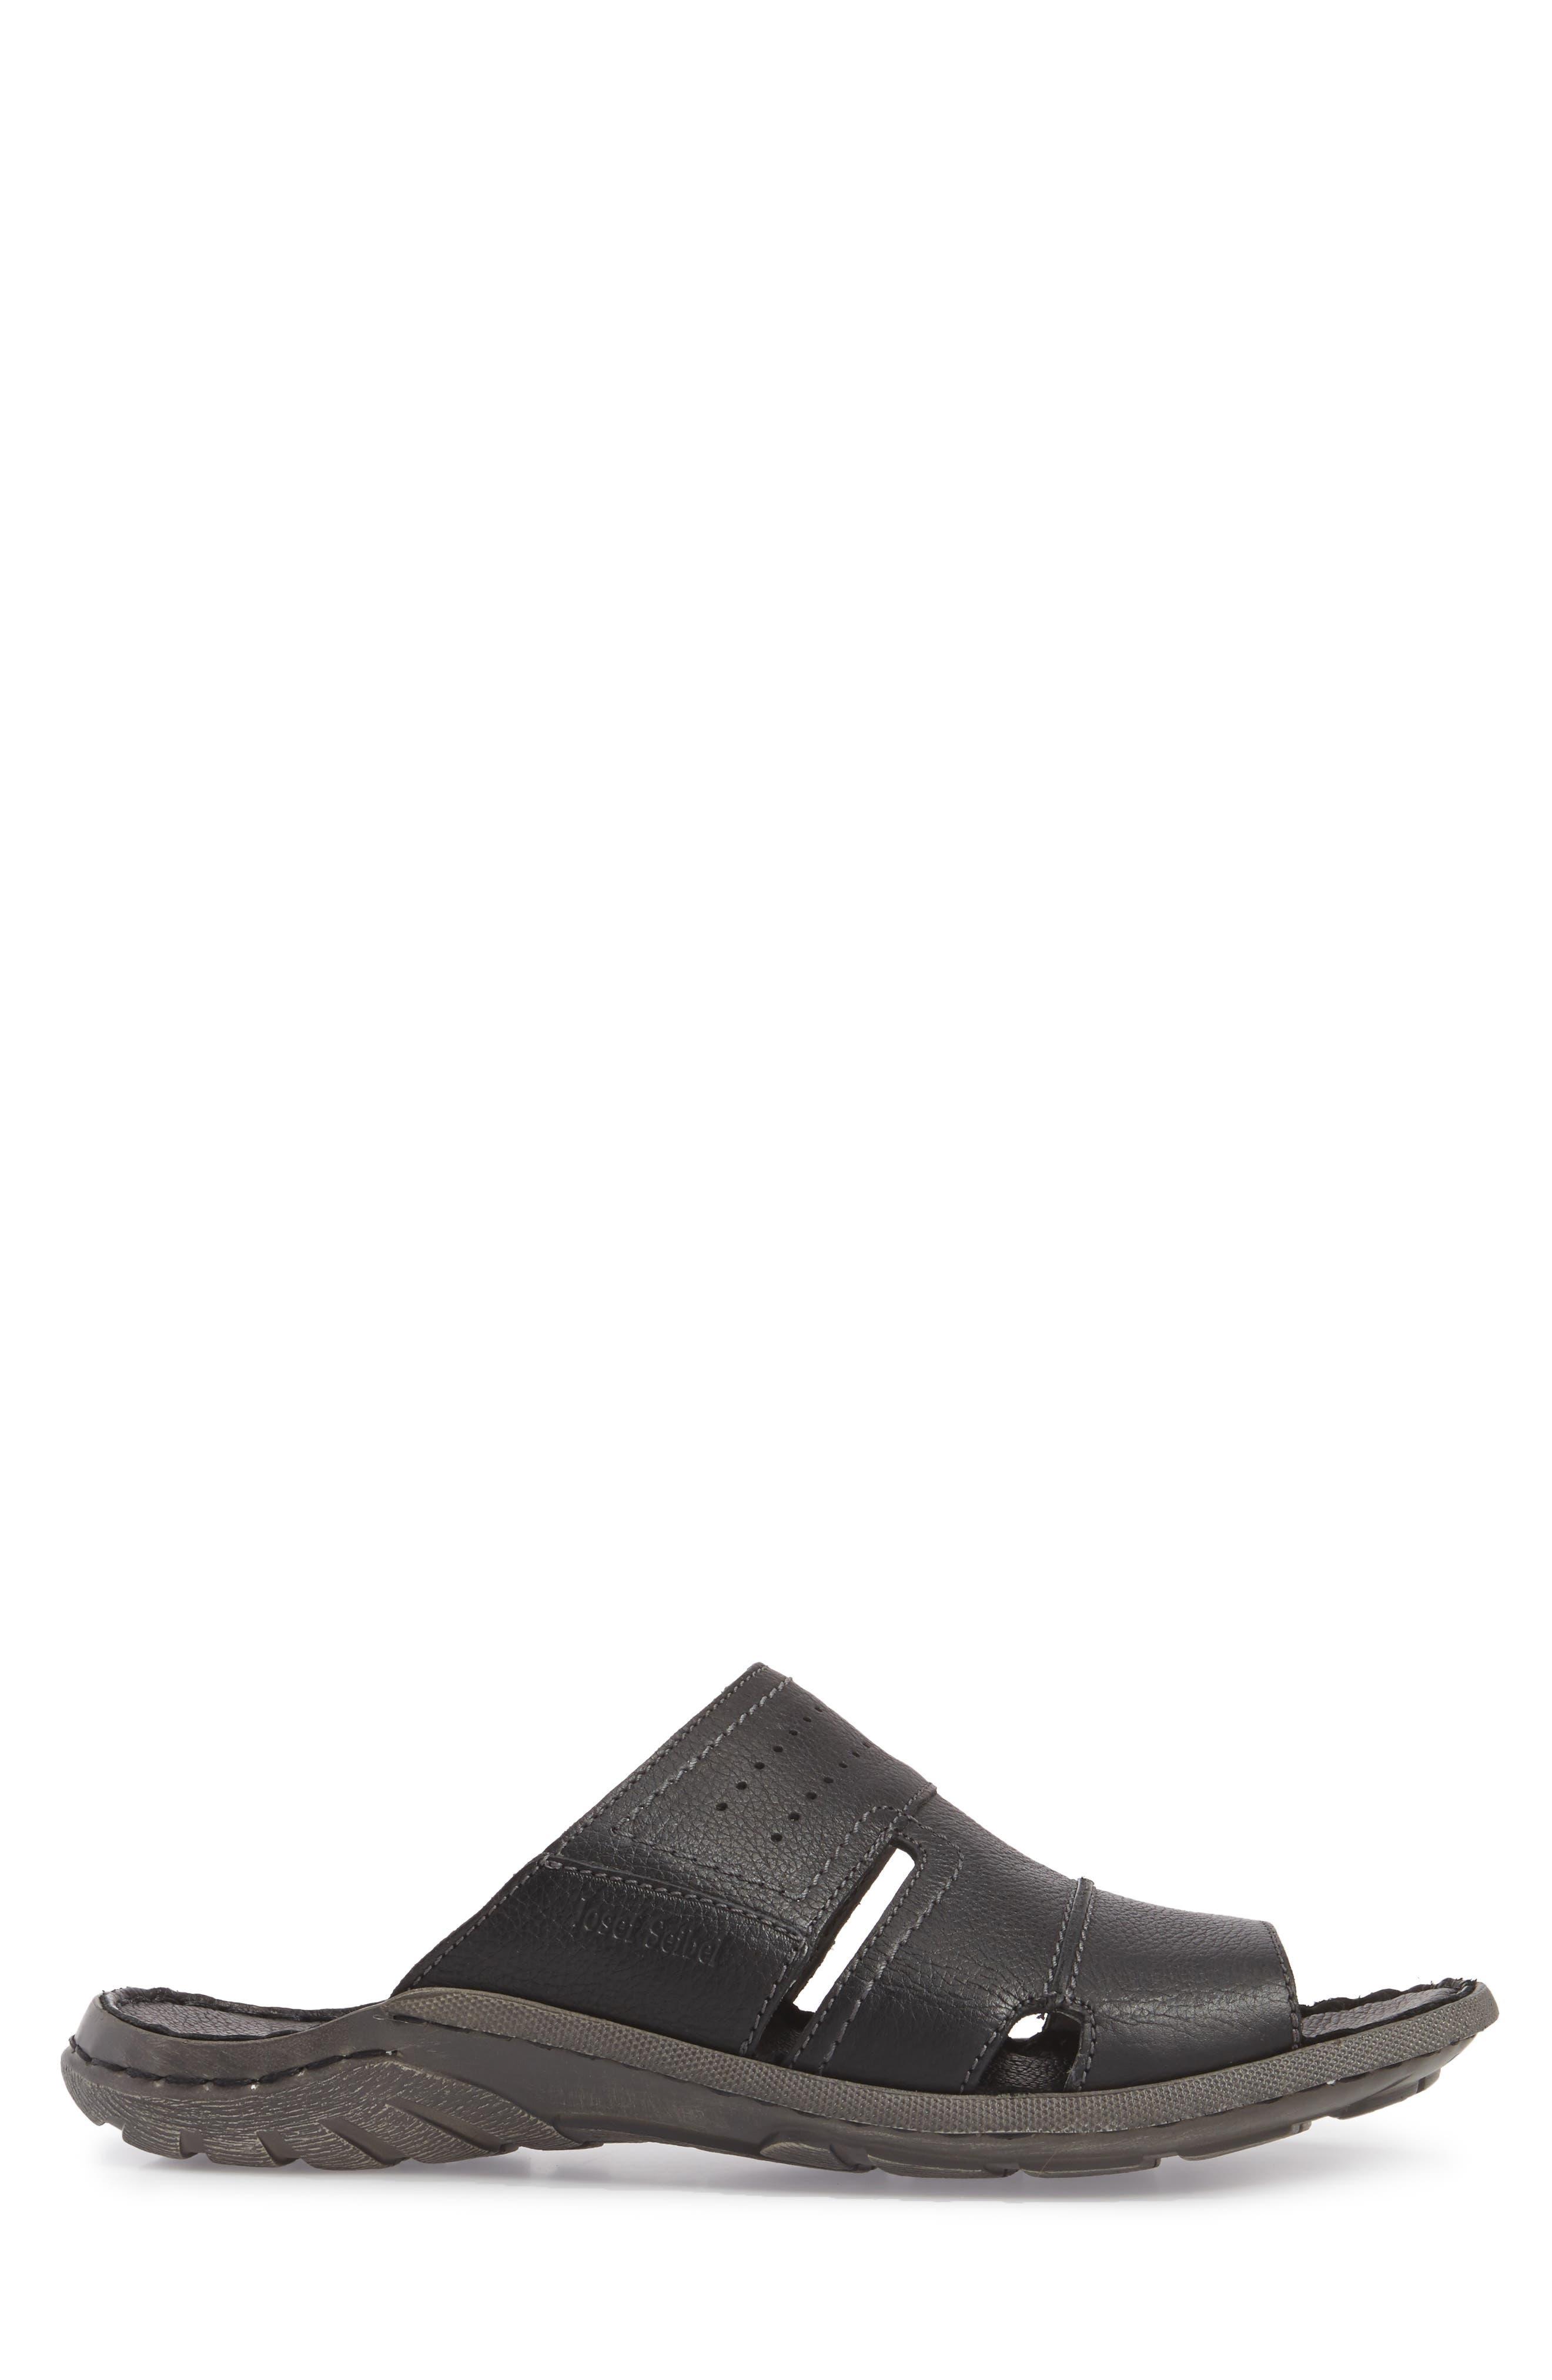 Alternate Image 3  - Josef Seibel Logan Slide Sandal (Men)